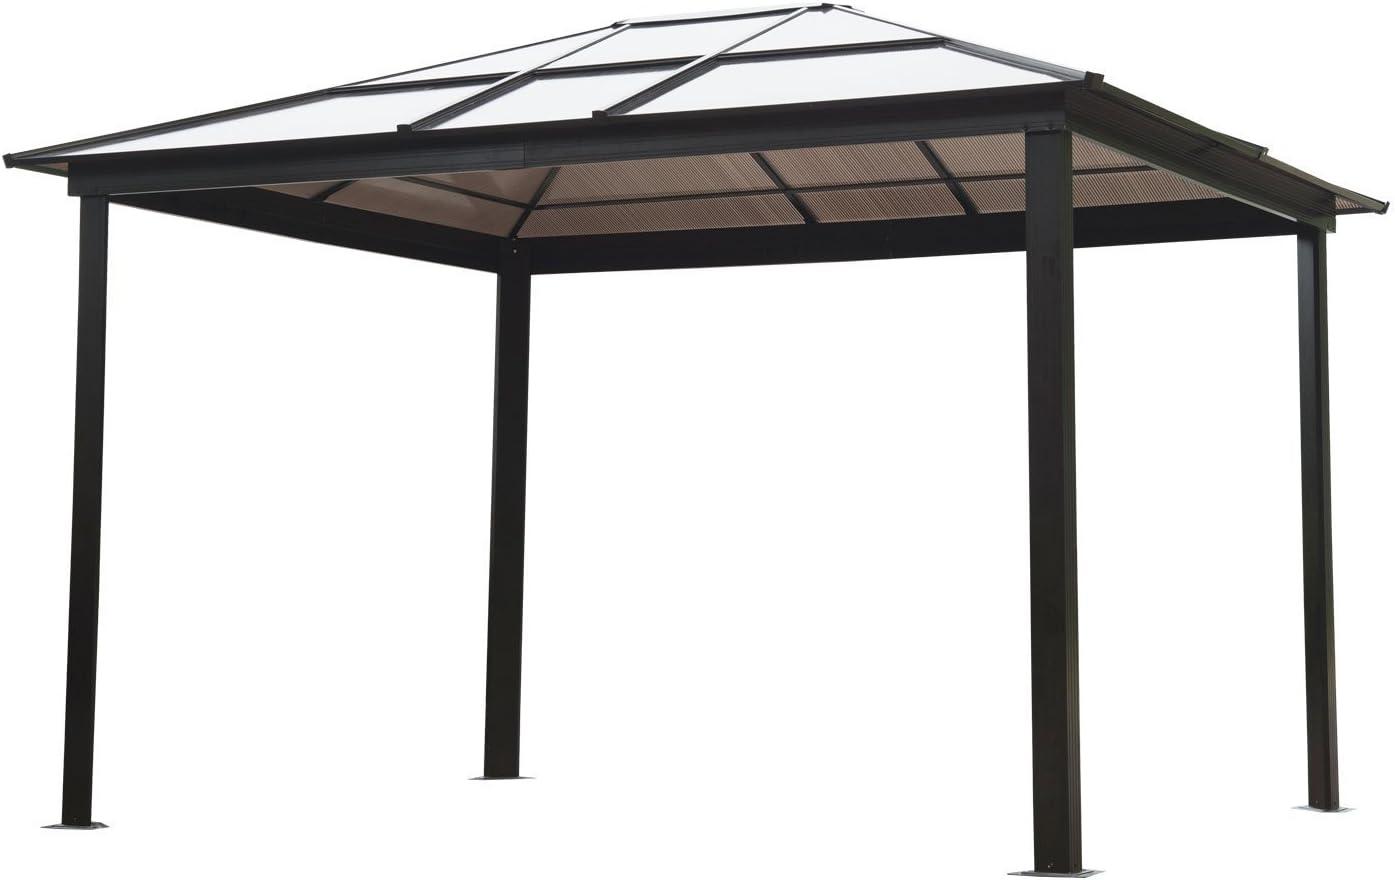 Outsunny® es un lujo Pavillon Gartenpavillon Alu Partyzelt PC lichtdurchlässigem Gartenzelt con techo.: Amazon.es: Jardín